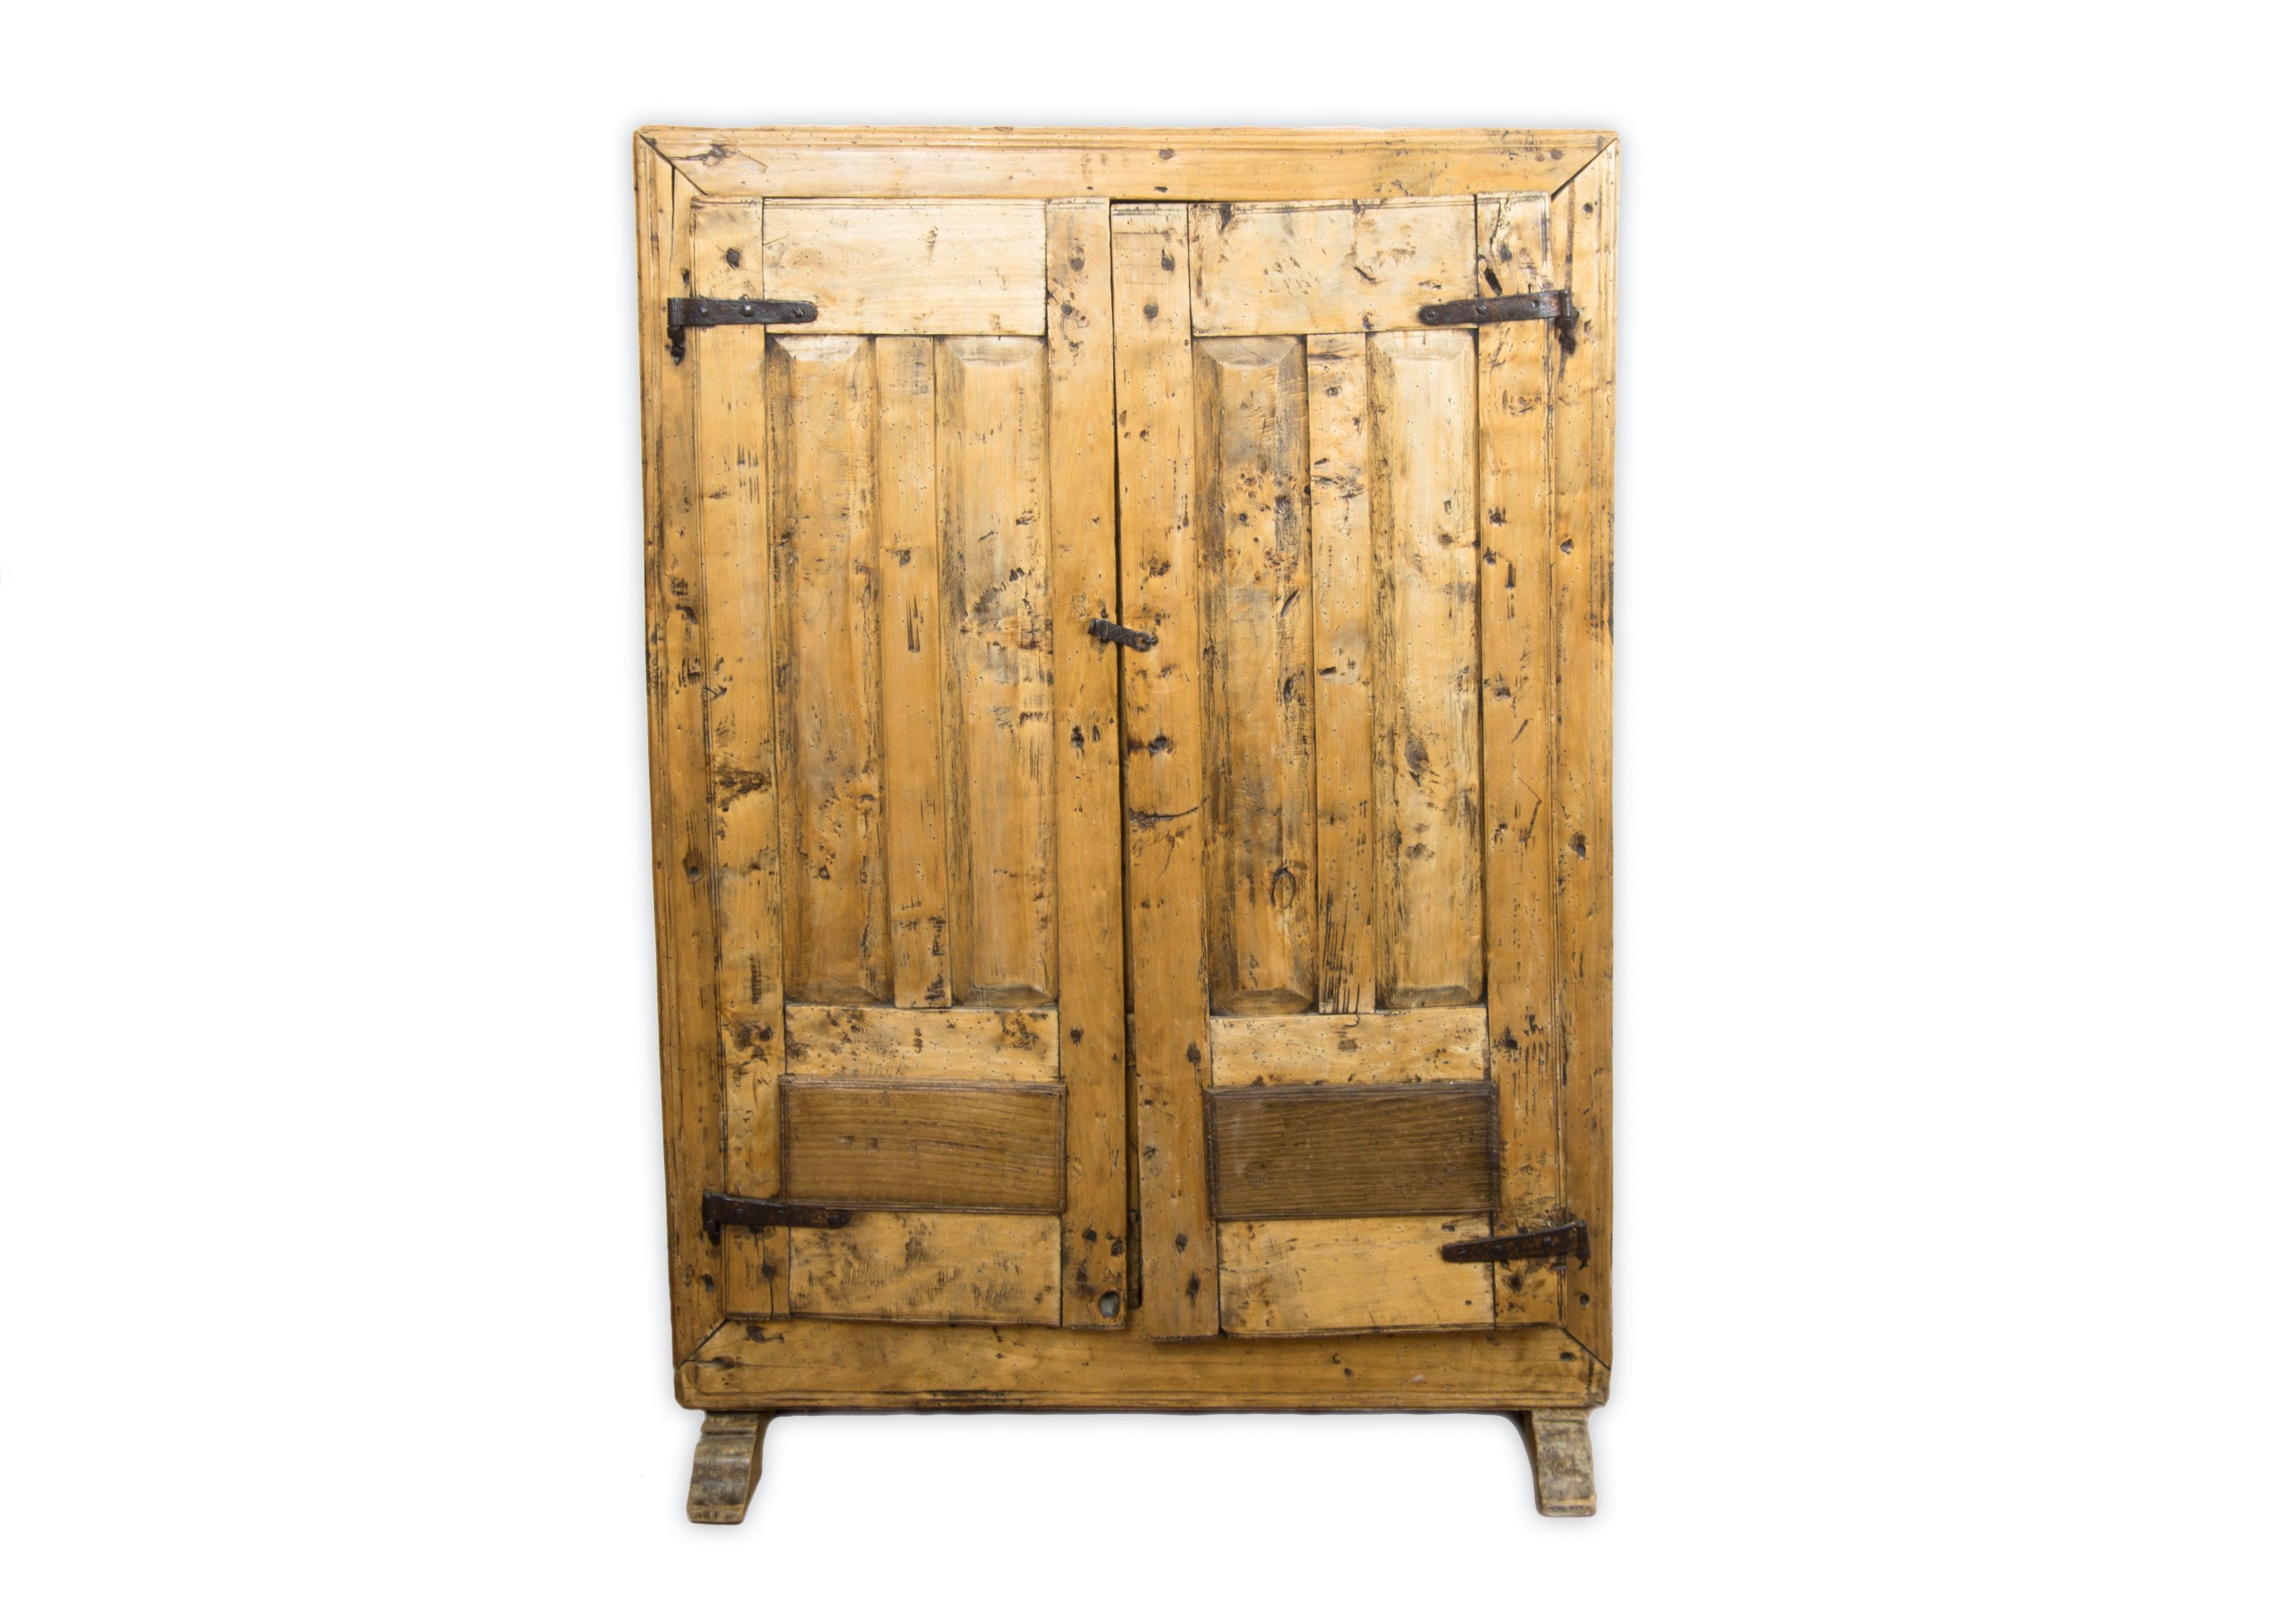 Antique Farmhouse Rustic Wood Pantry Cabinet ...